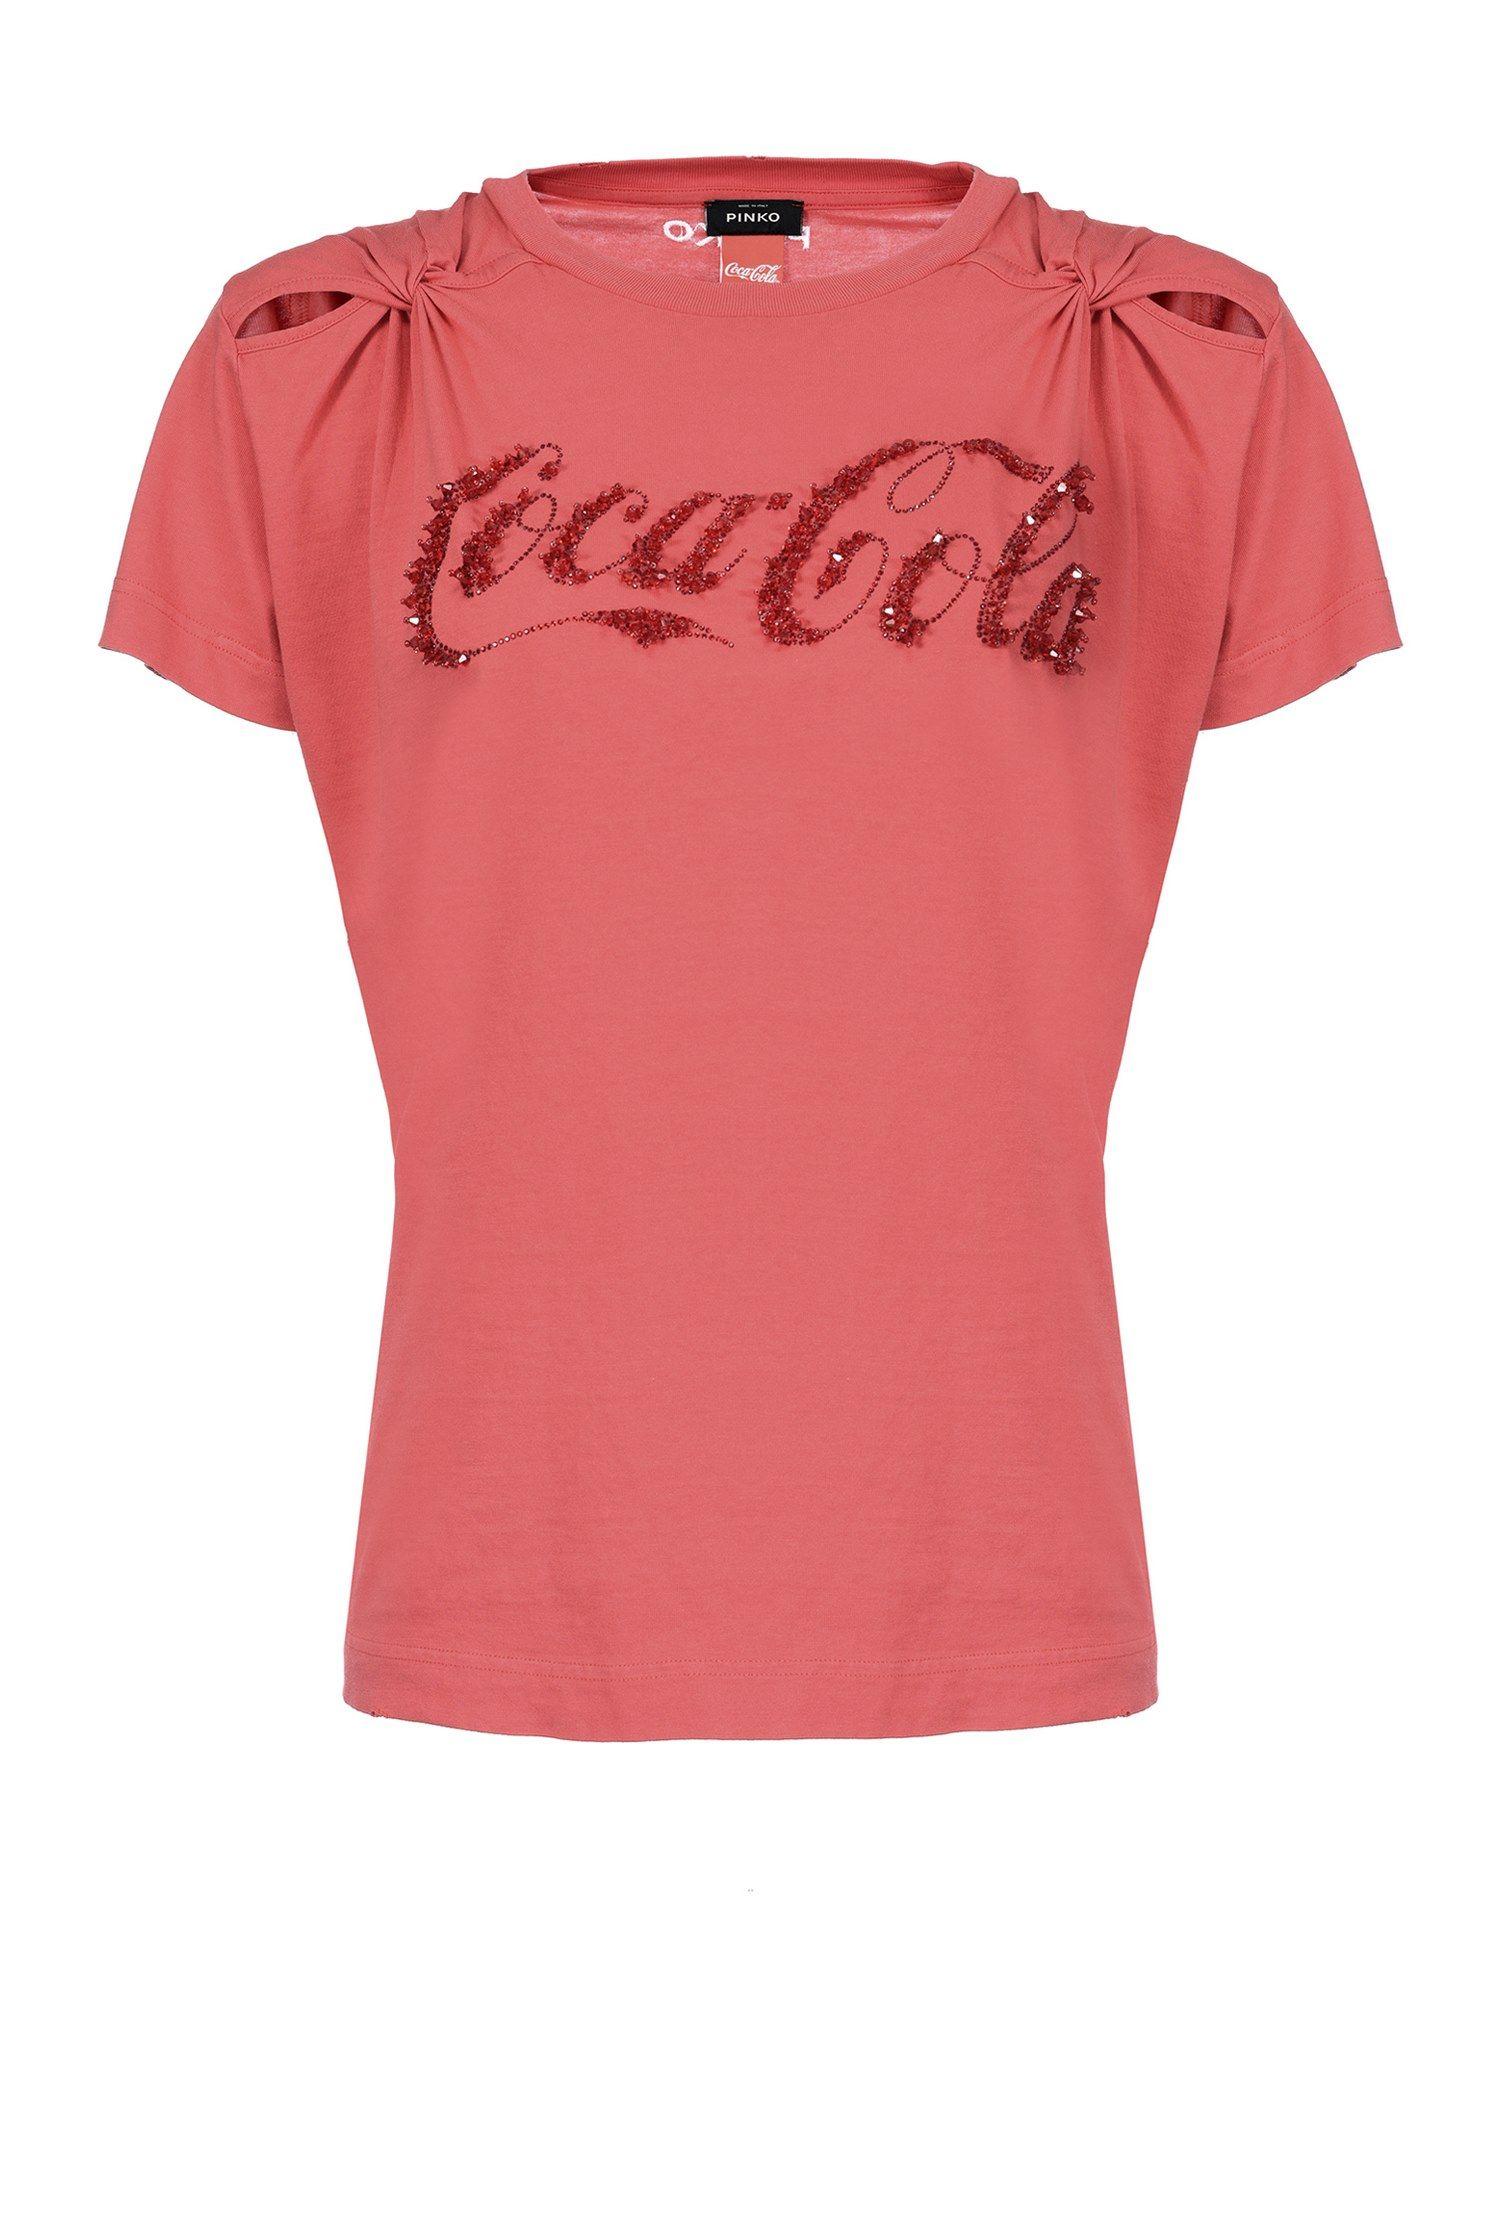 Pinko wears Coca Cola! Reinterpretation of the classic cotton T-shirt shown  here with f0c51d38663